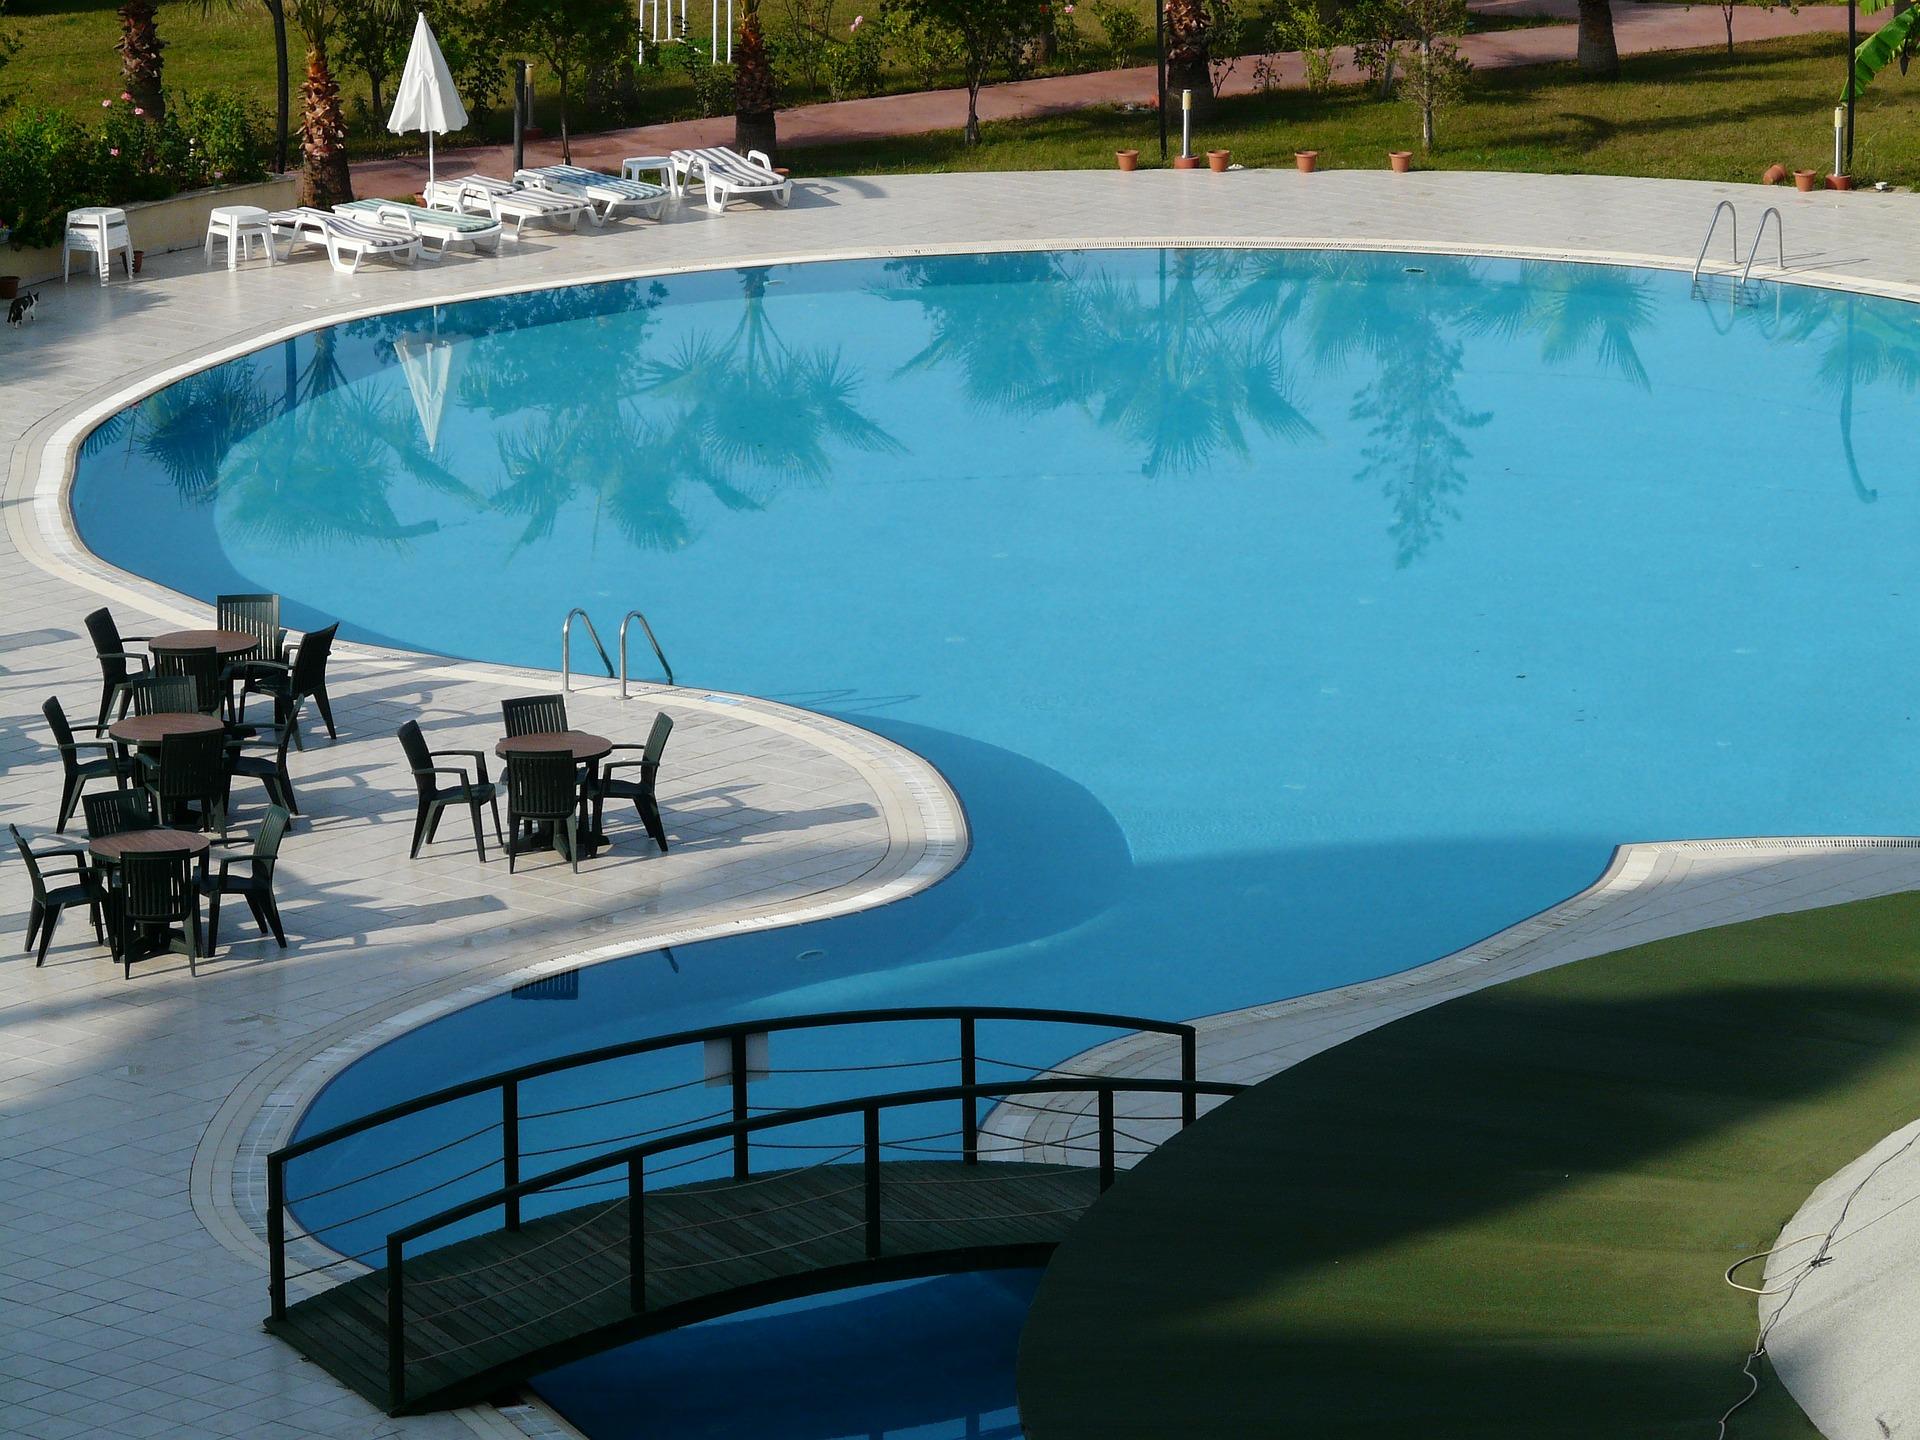 construirea unei piscine de cat spatiu e nevoie hobbit